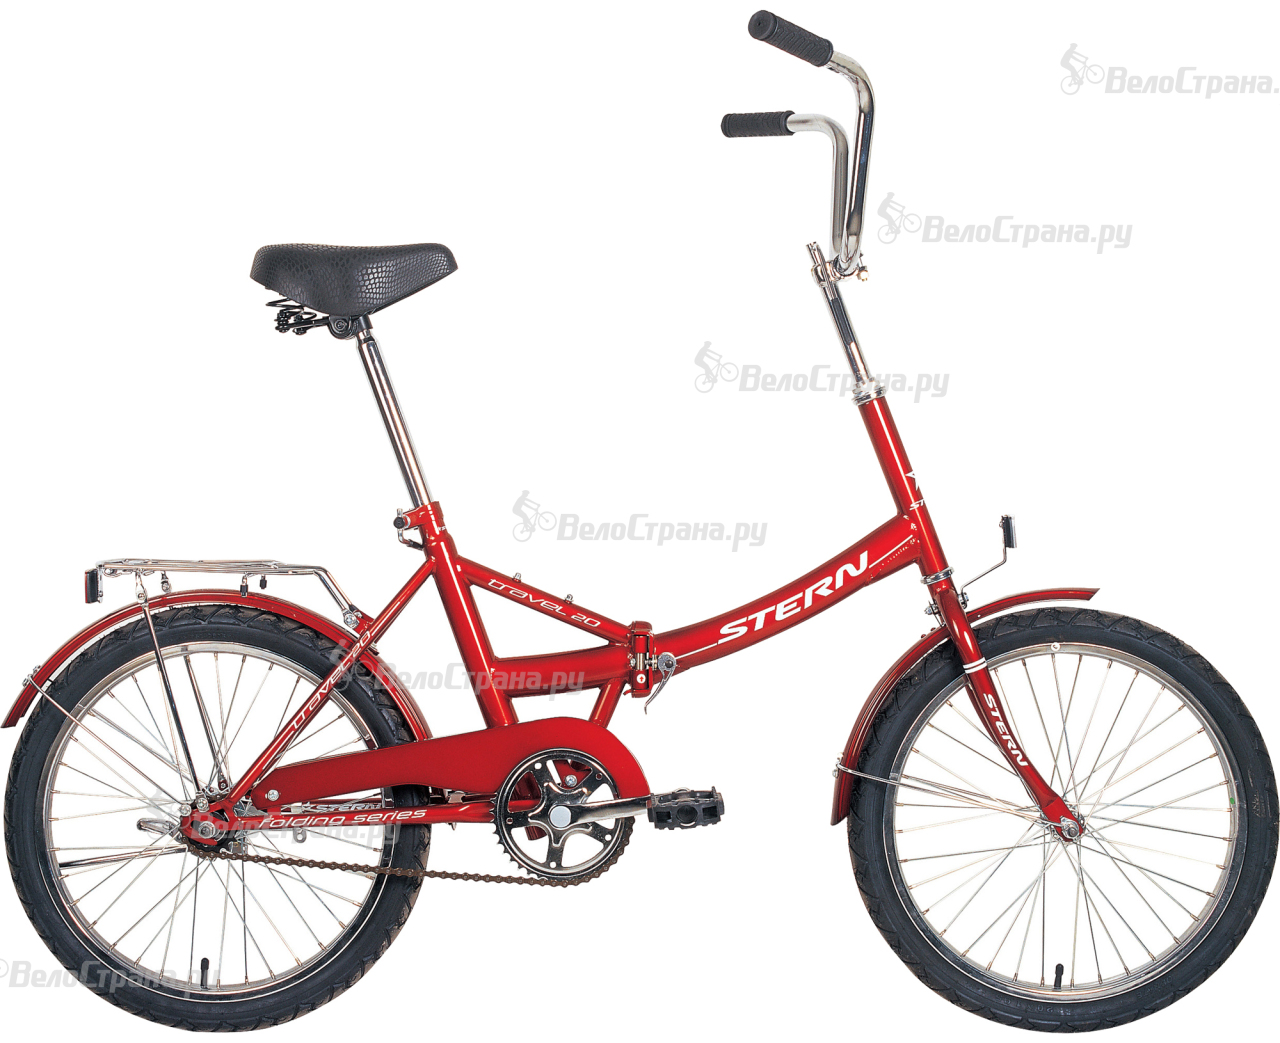 Велосипед Stern Travel 20 (2017) велосипед stern fantasy 20 2017